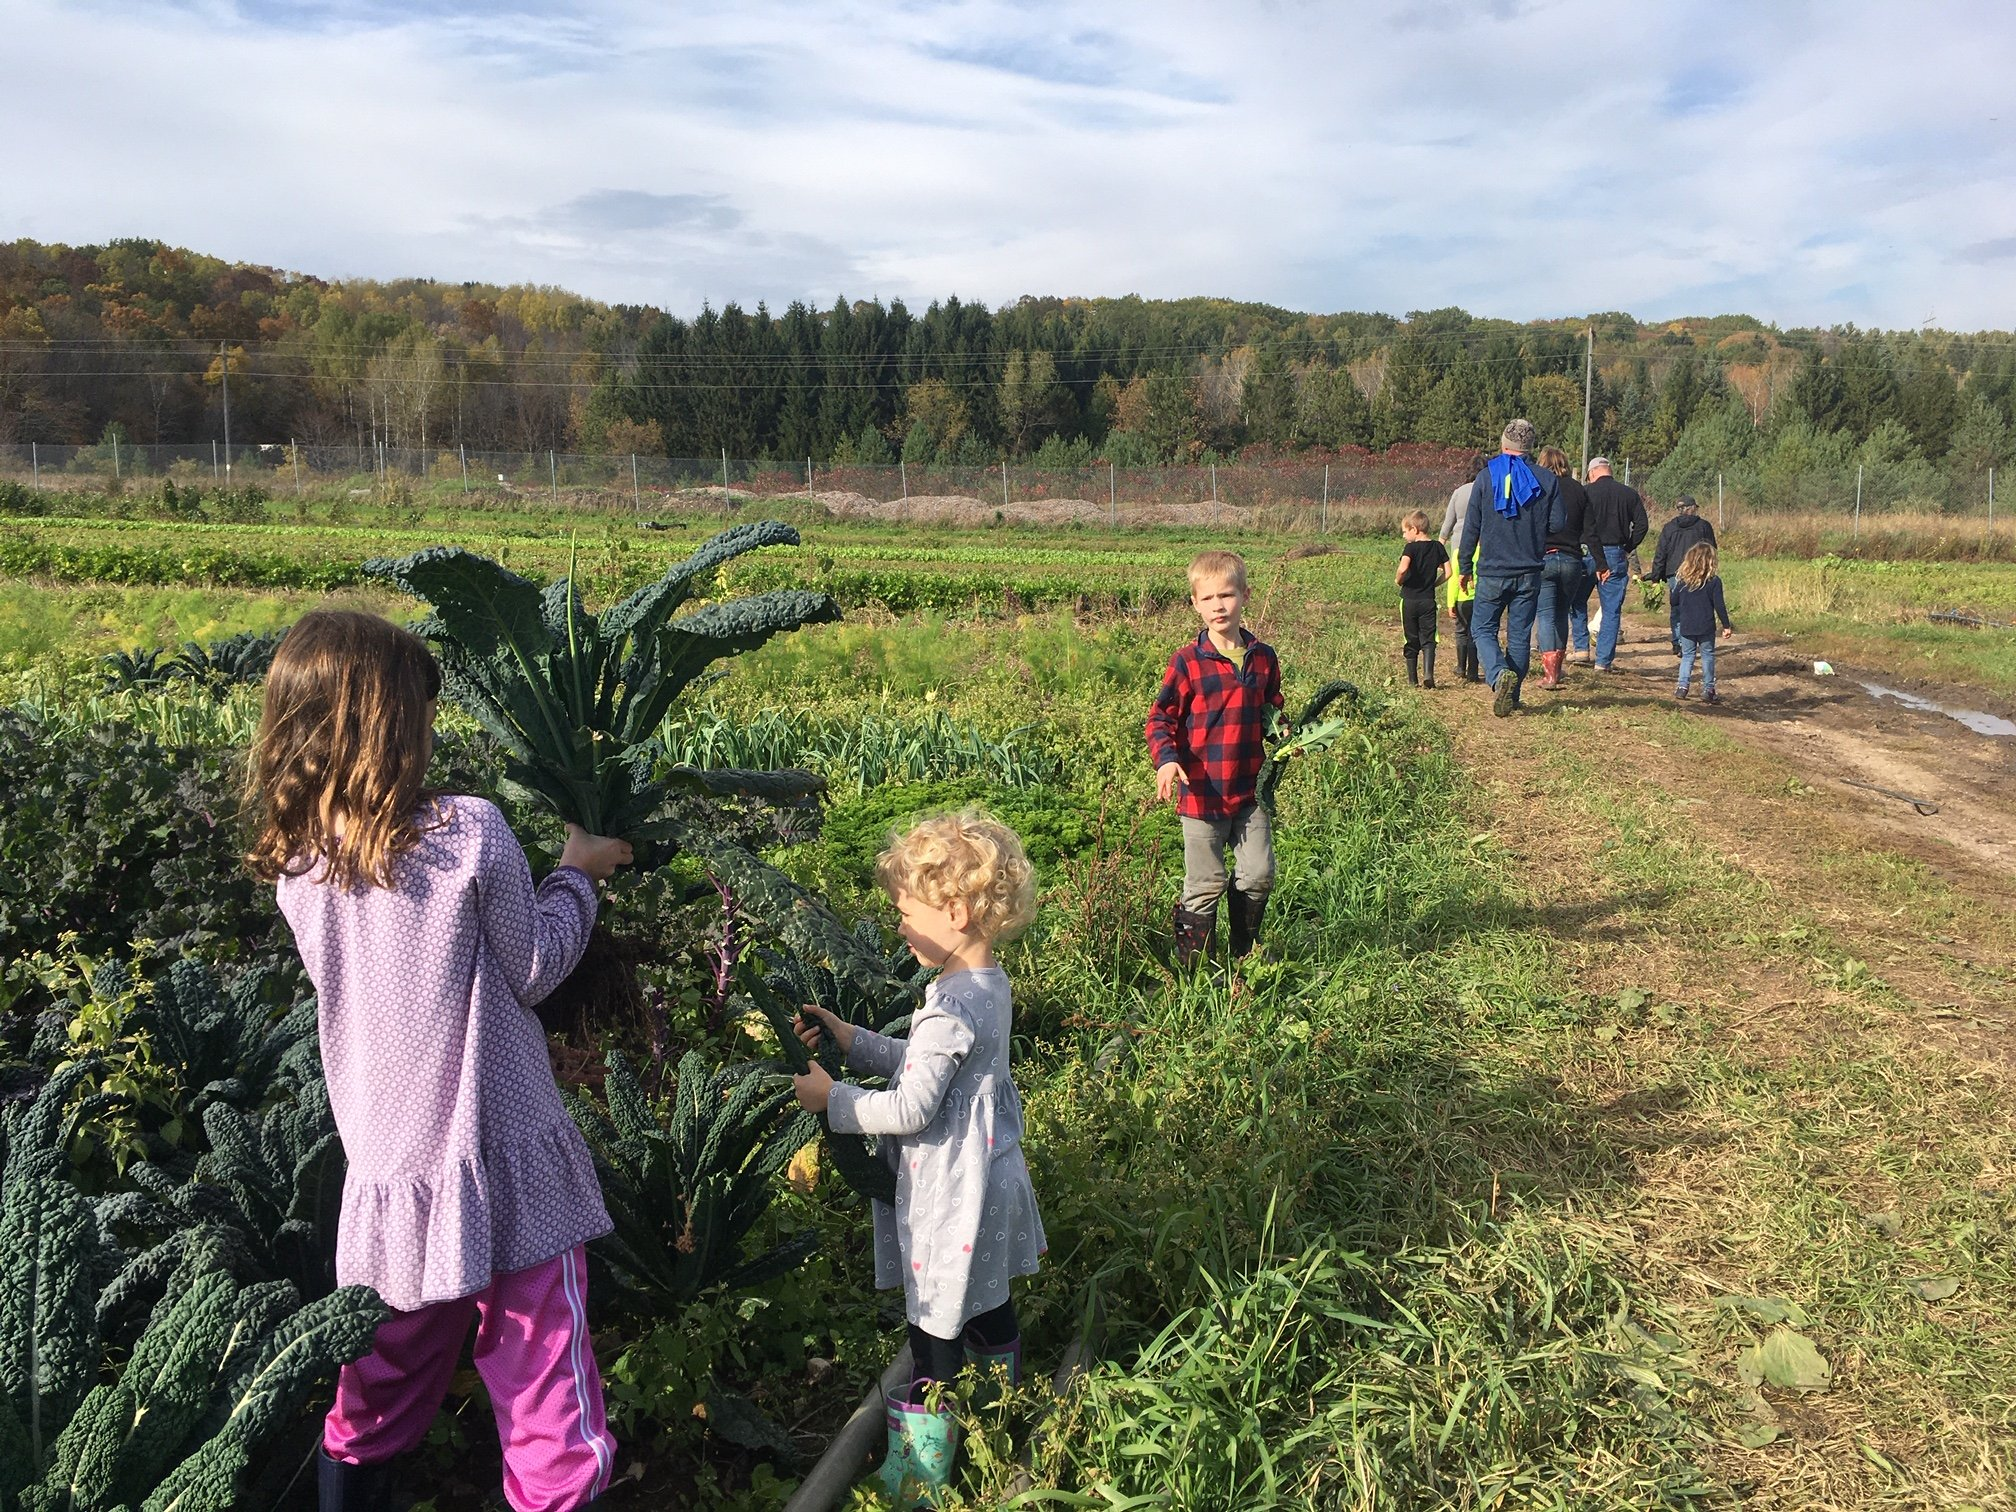 Farm Happenings for October 23, 2019